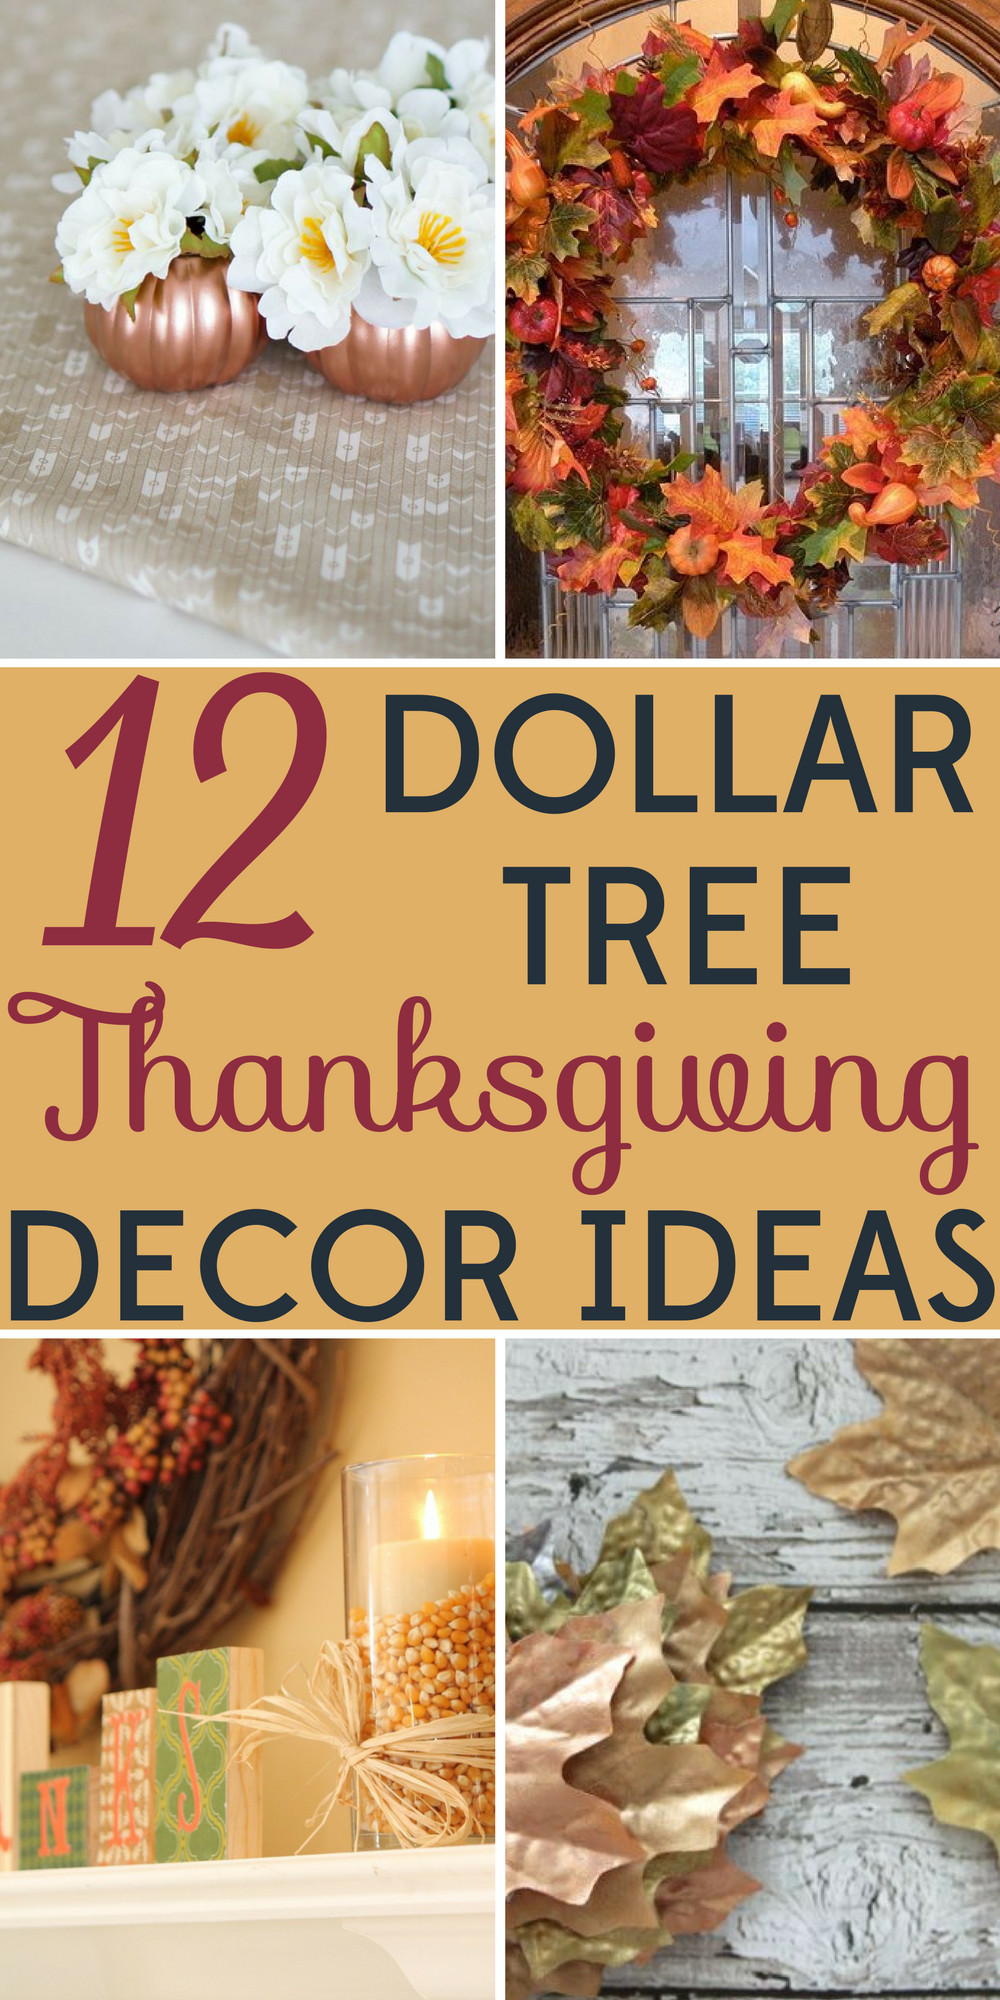 DIY Thanksgiving Decor Pinterest  Decorating on a Bud 12 Dollar Tree Thanksgiving Decor